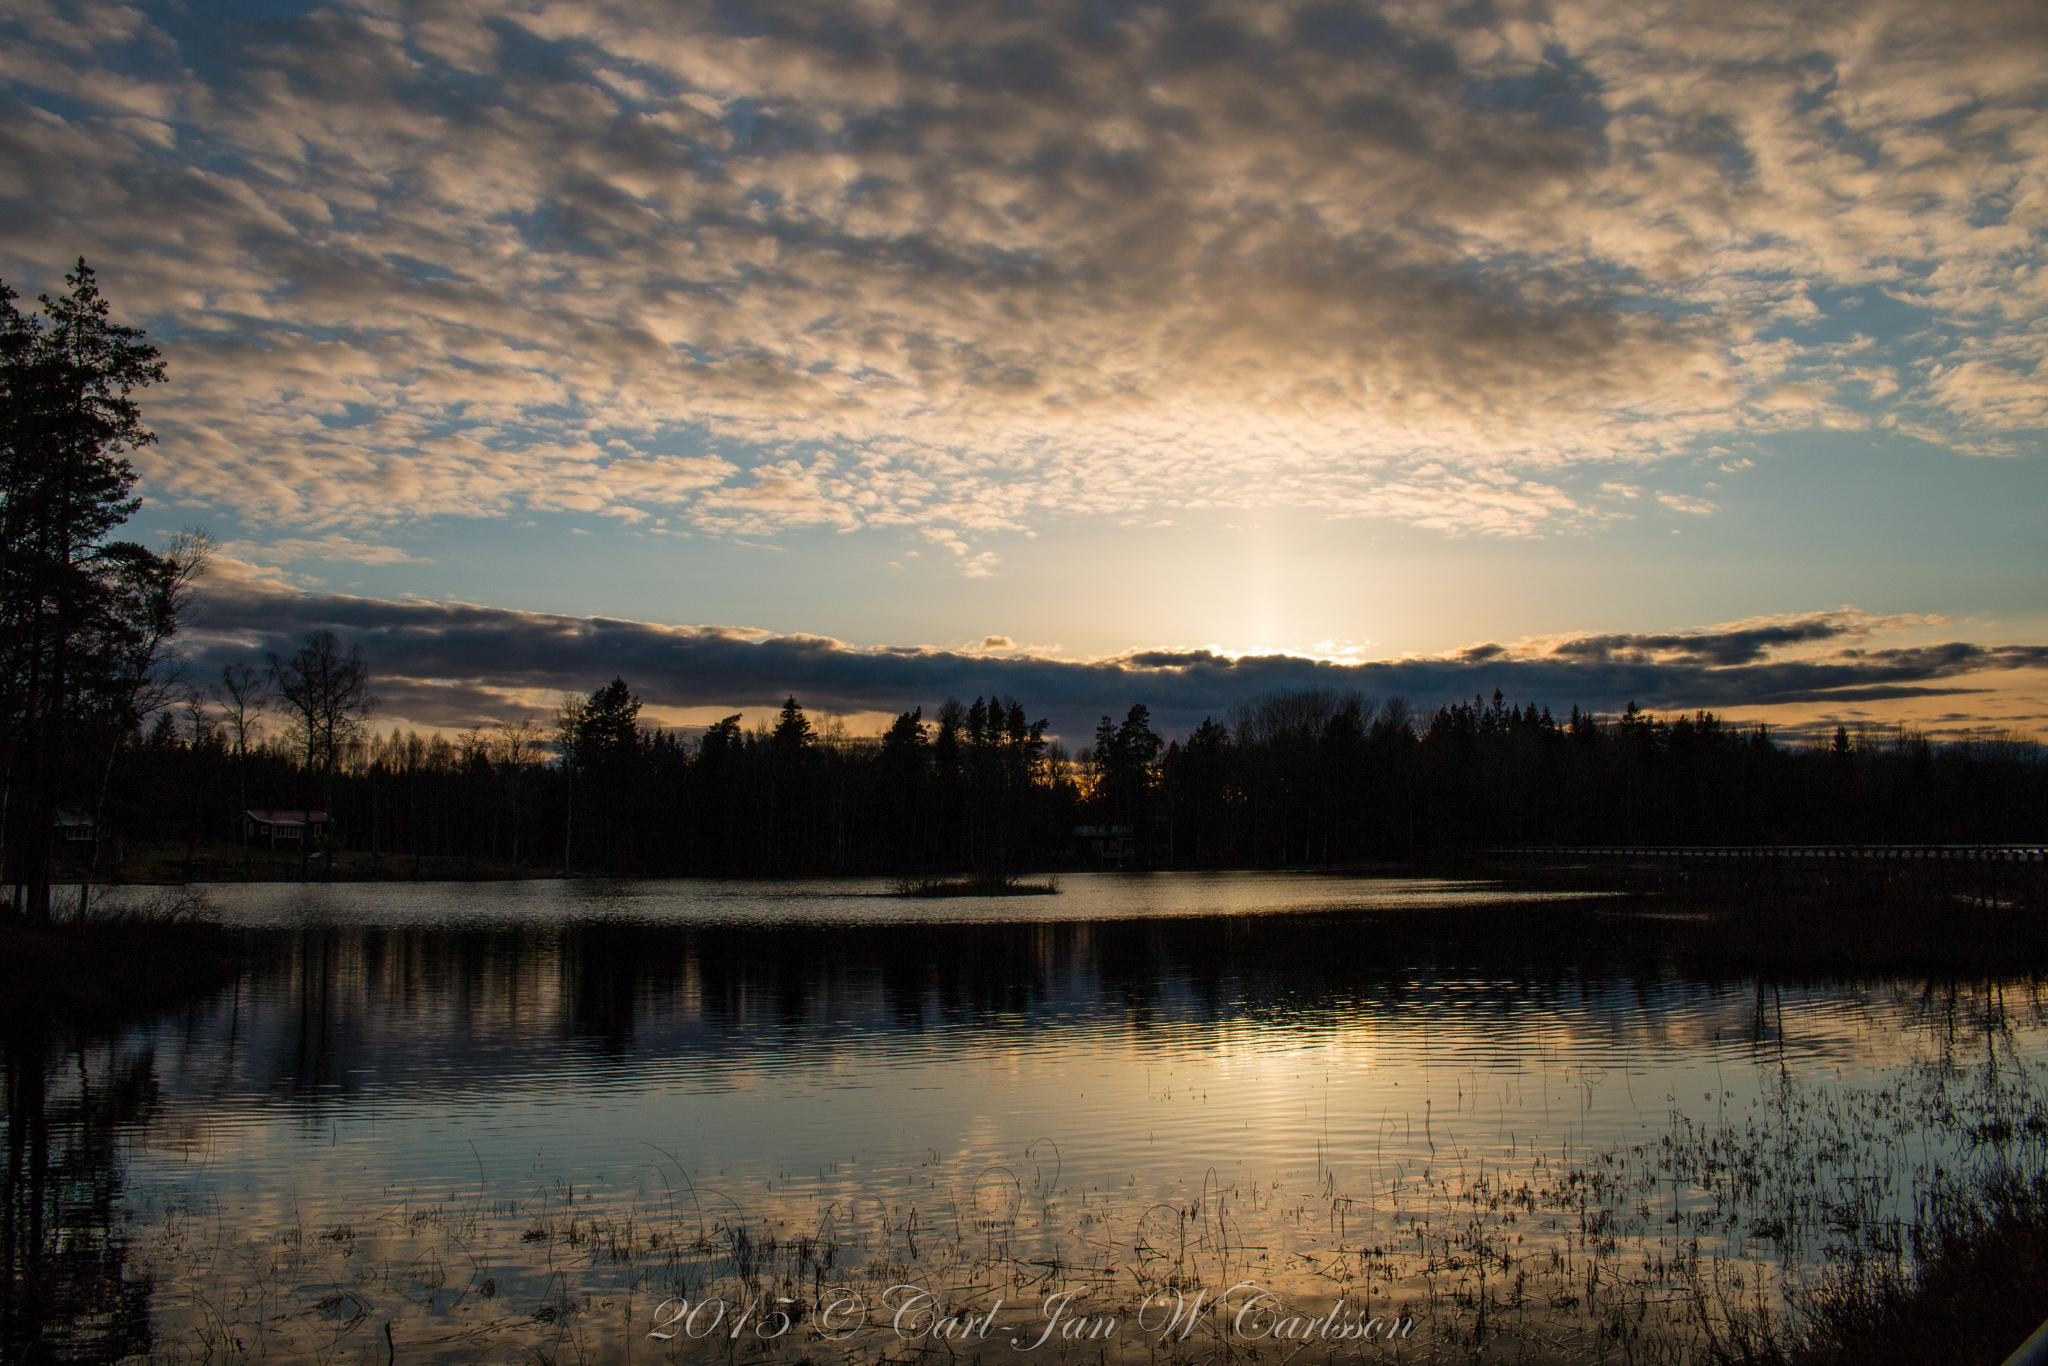 April Evening Sky by carljan w carlsson